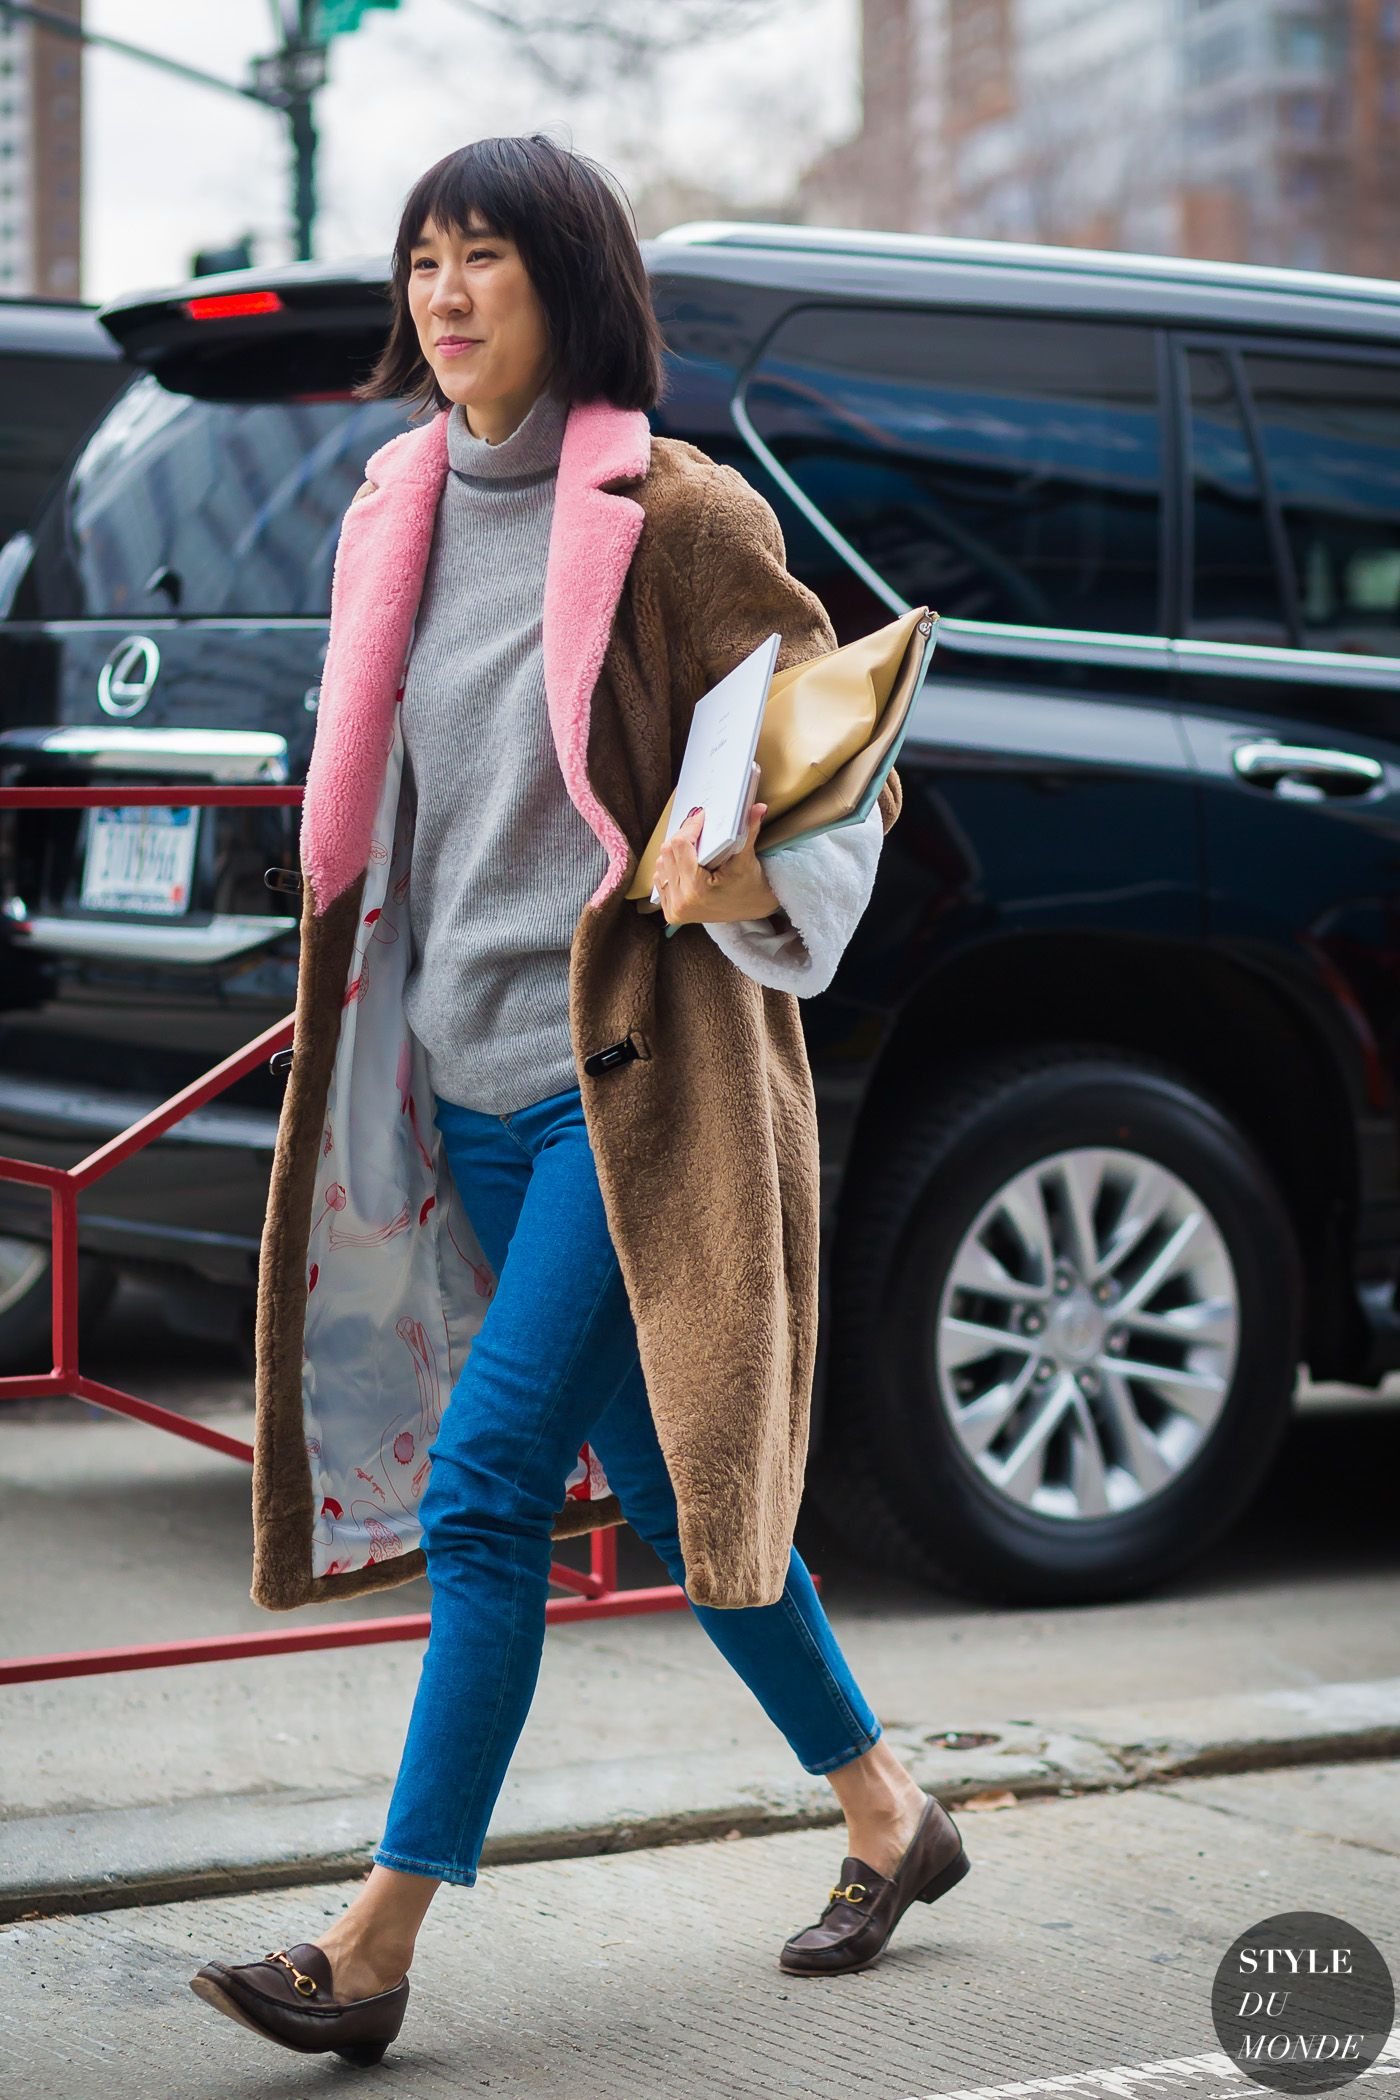 2cddae6c2e New York Fashion Week FW 2016 Street Style: Eva Chen   Wardrobe ...